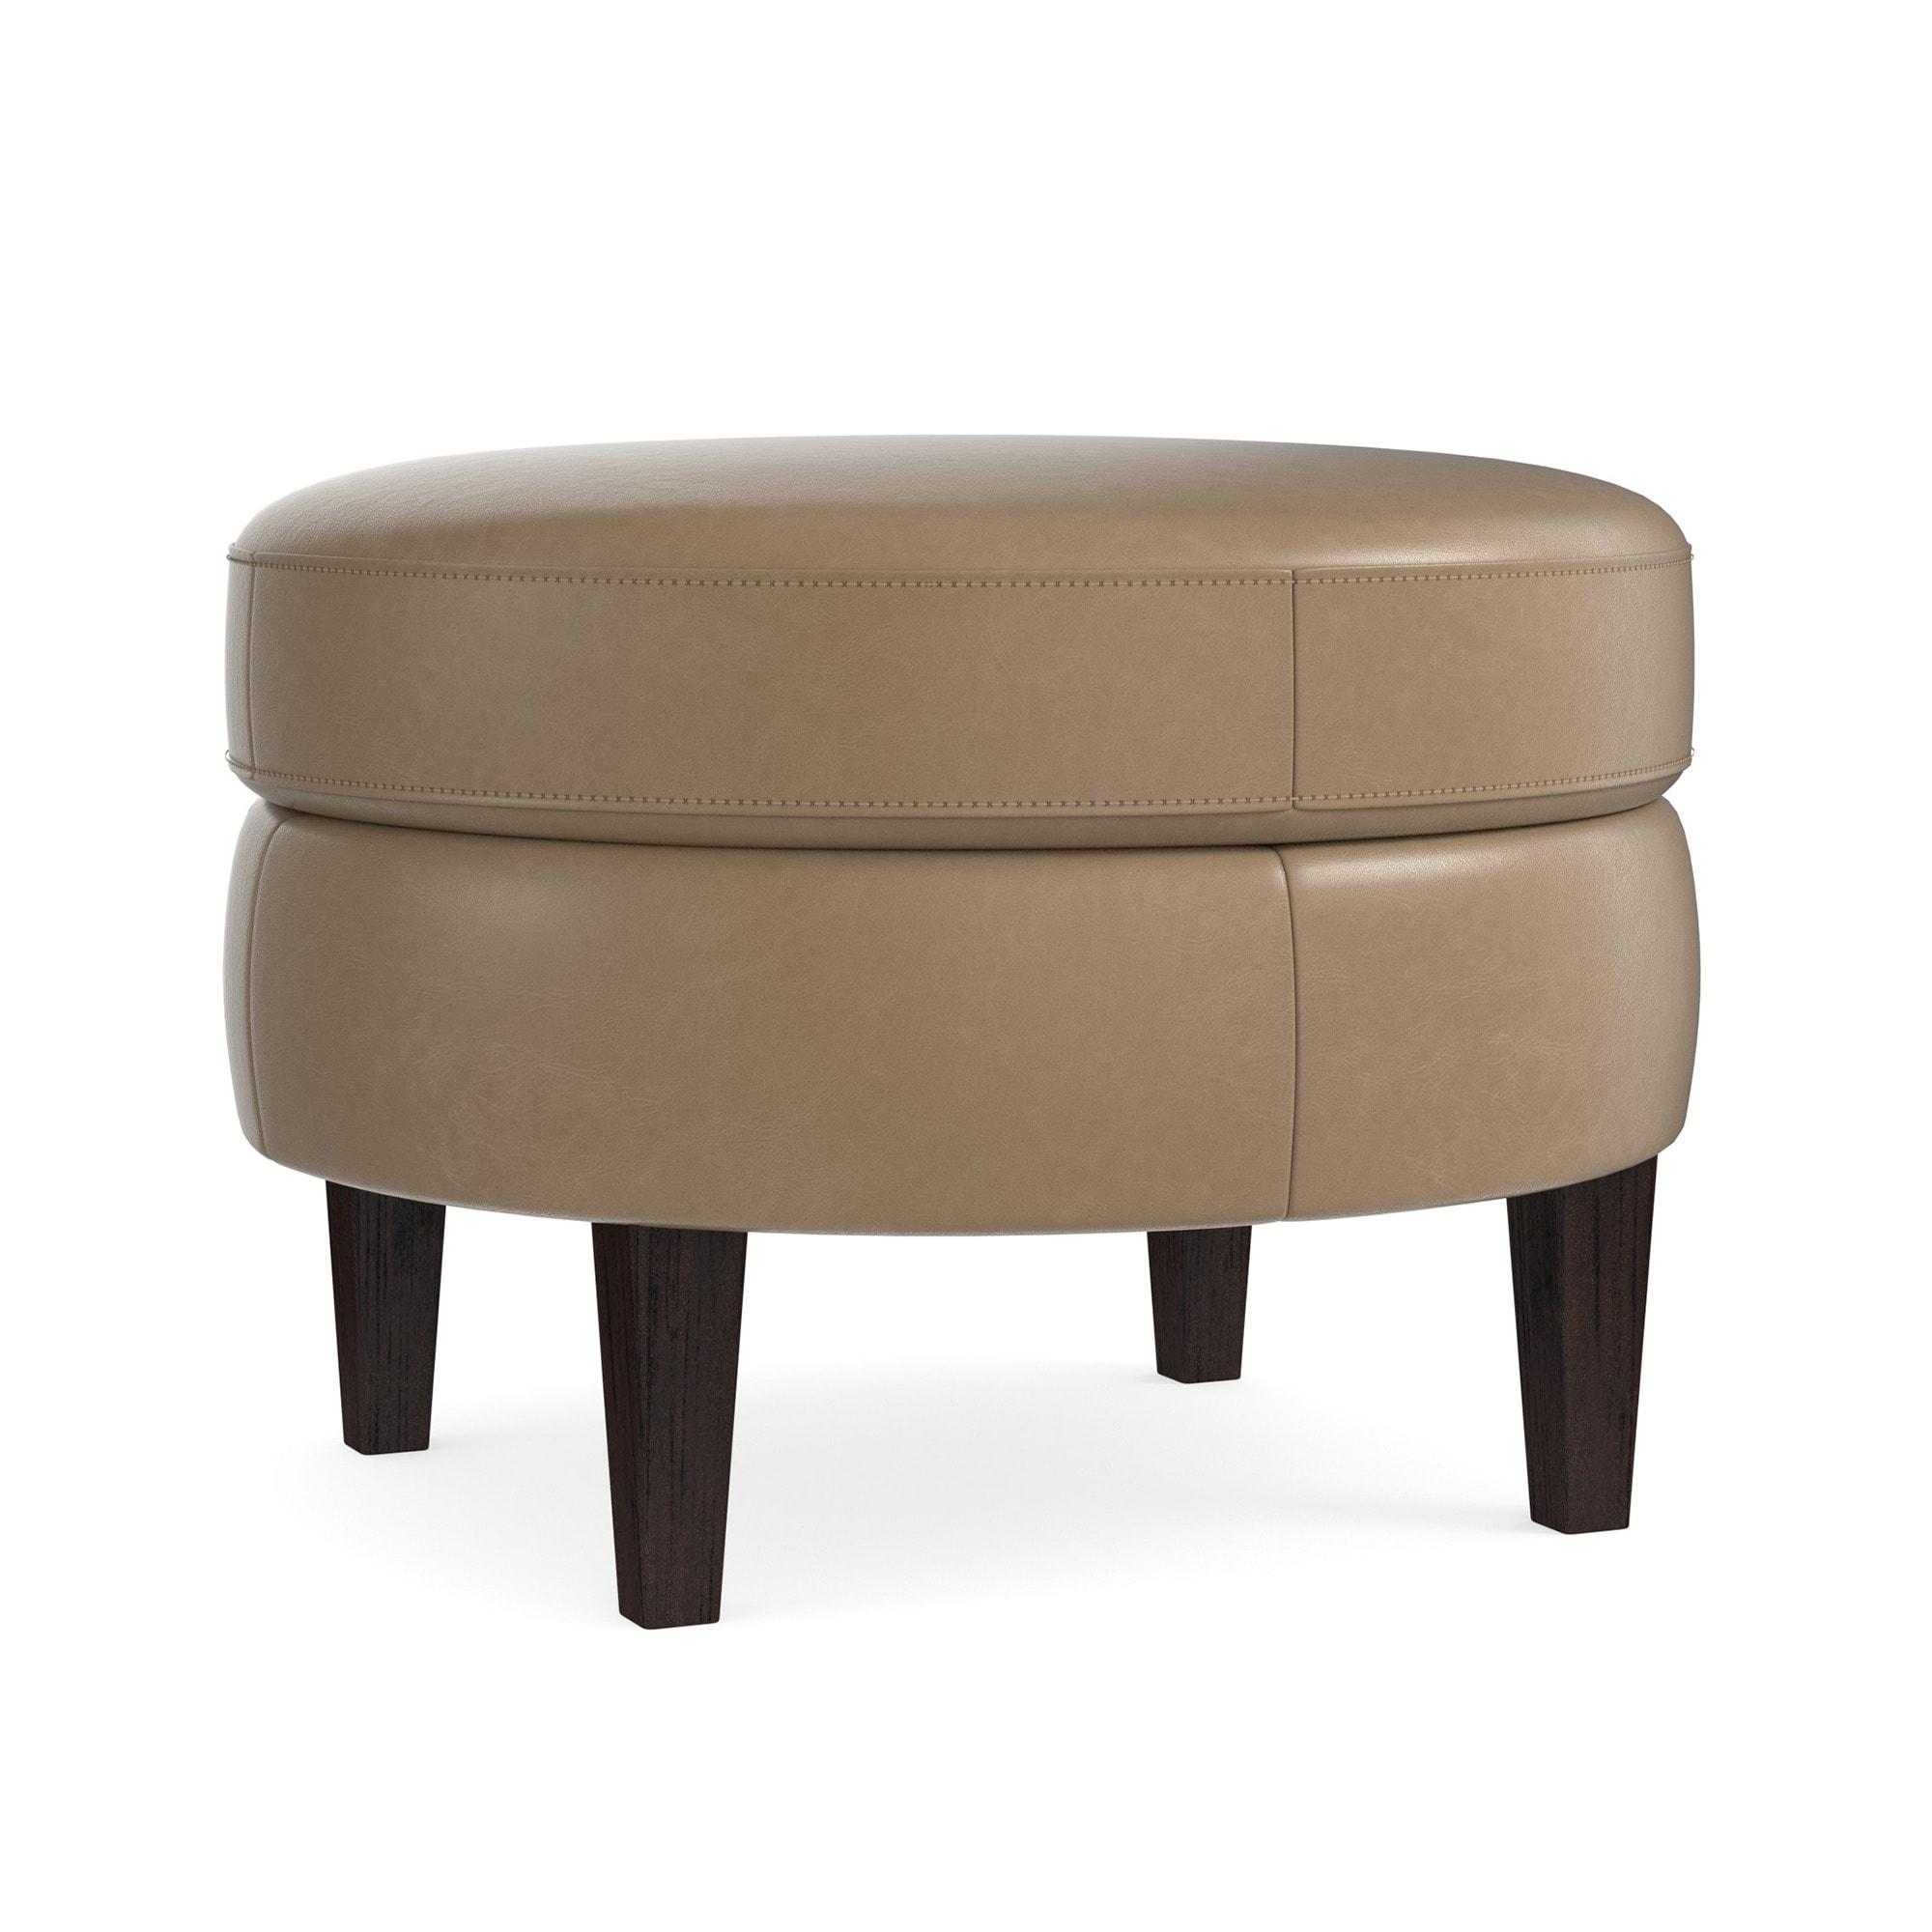 - Custom Ottoman & Bench Leather Round Ottoman